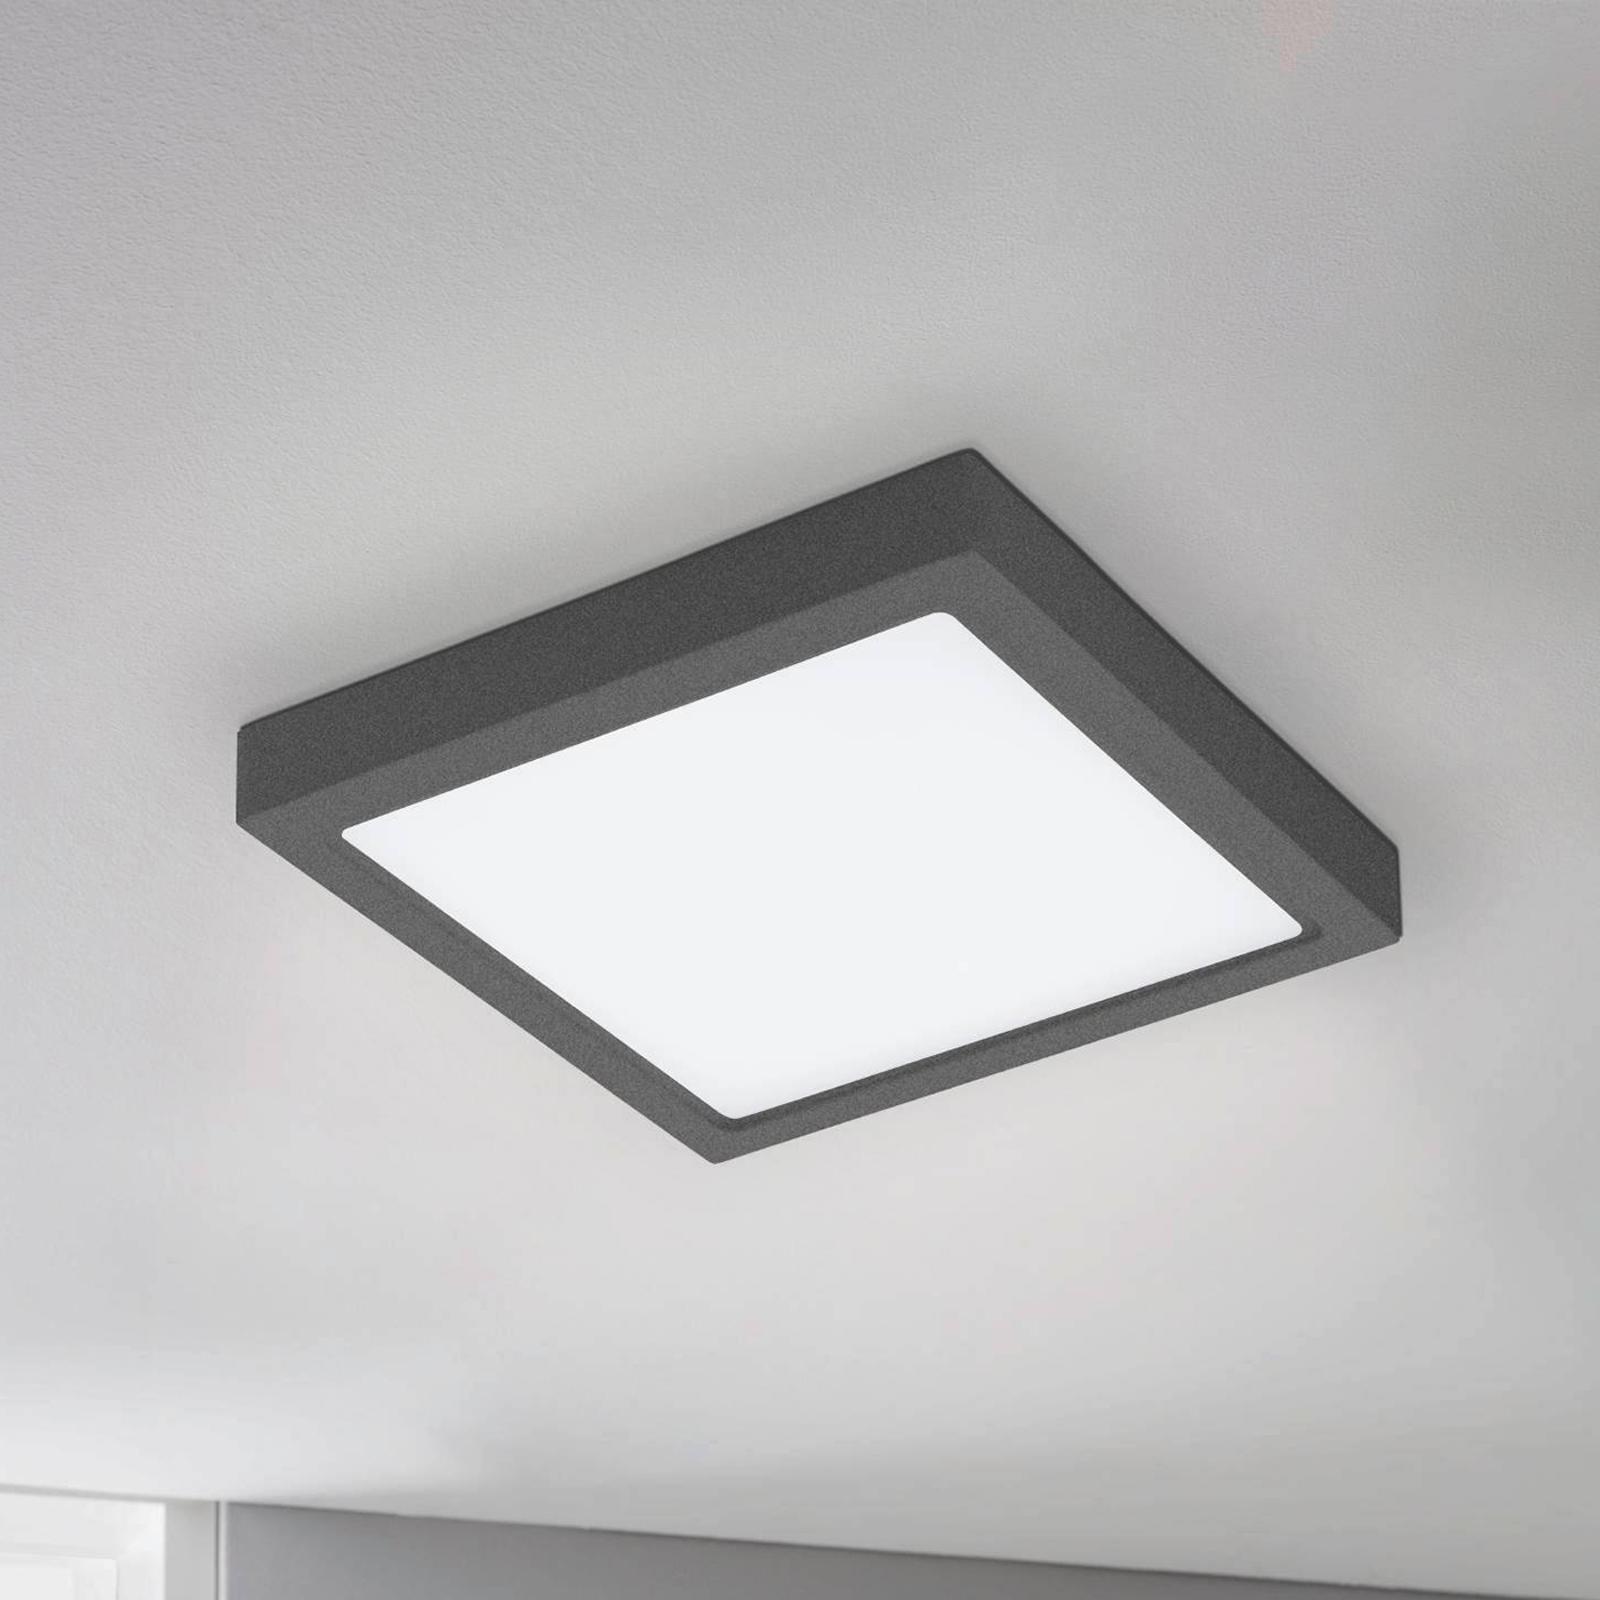 EGLO connect Argolis-C lampada angolare antracite